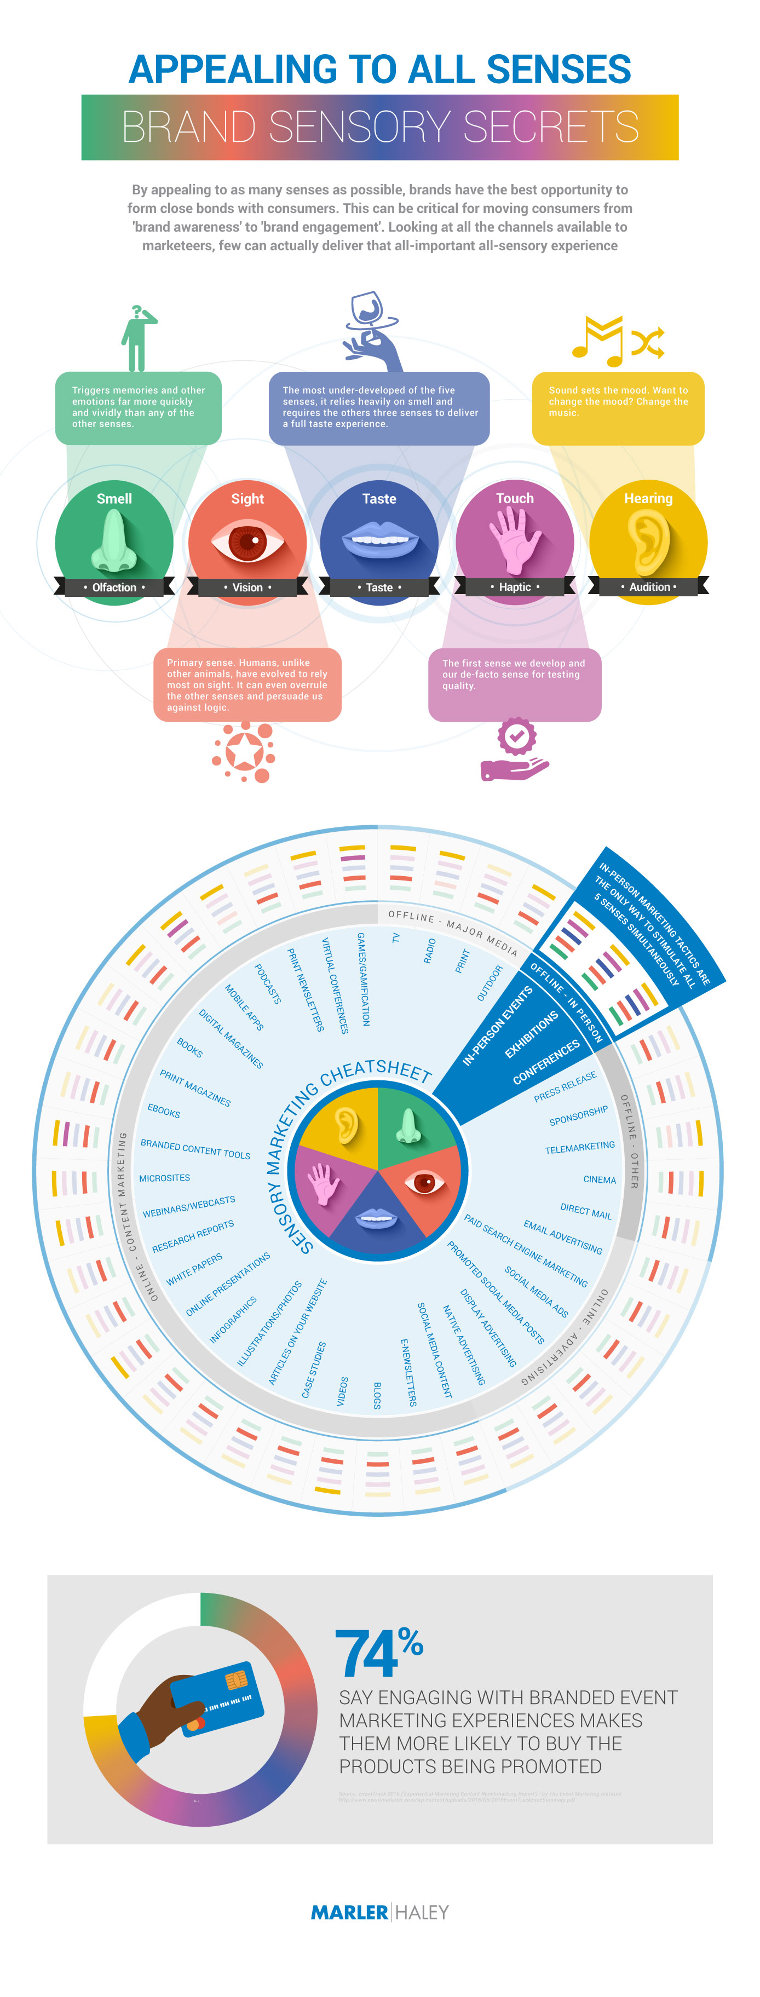 Brand sensory secrets infographic